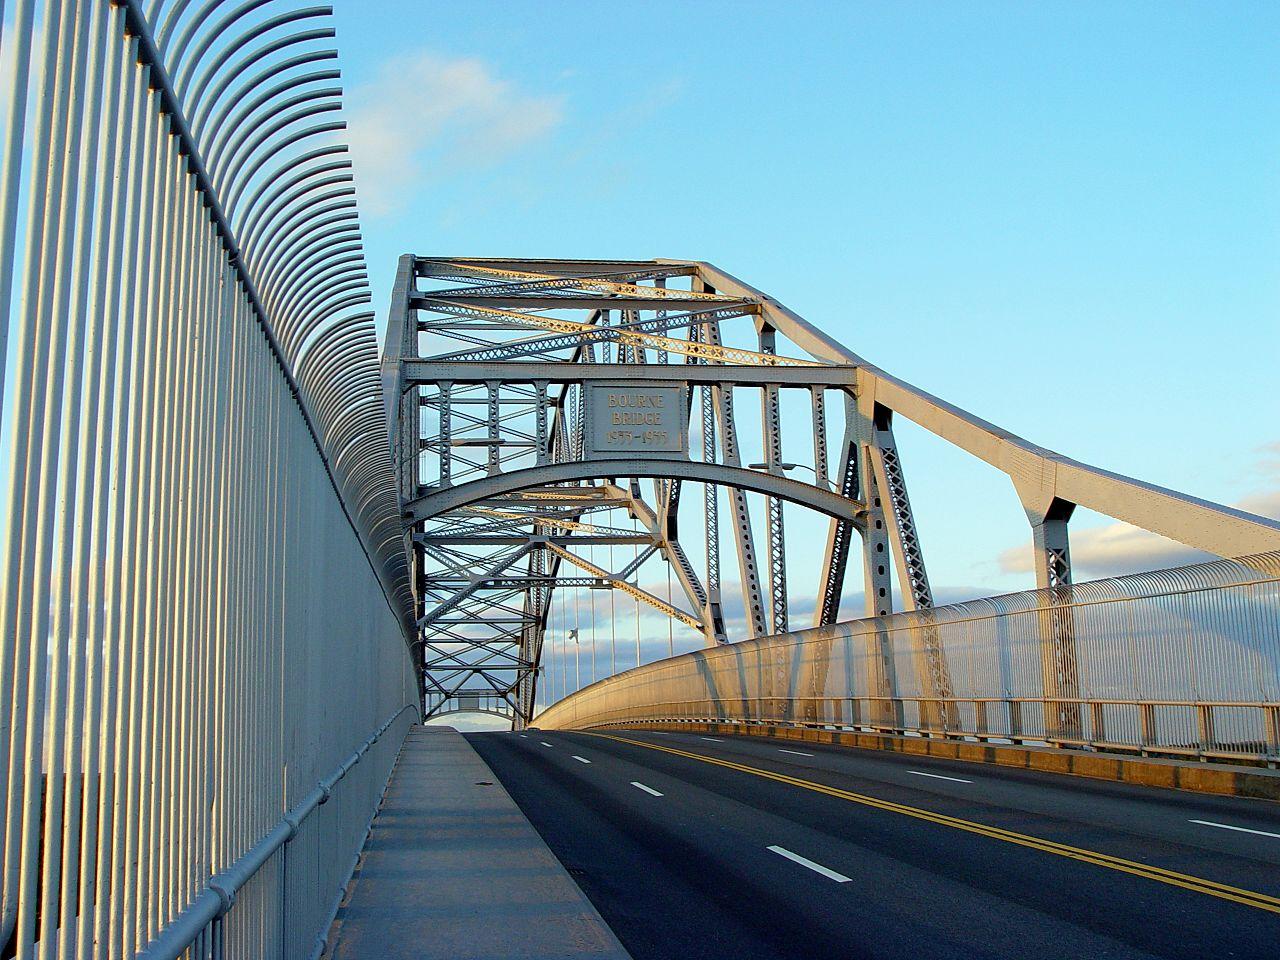 Bourne Bridge_1553527567790.jpg.jpg